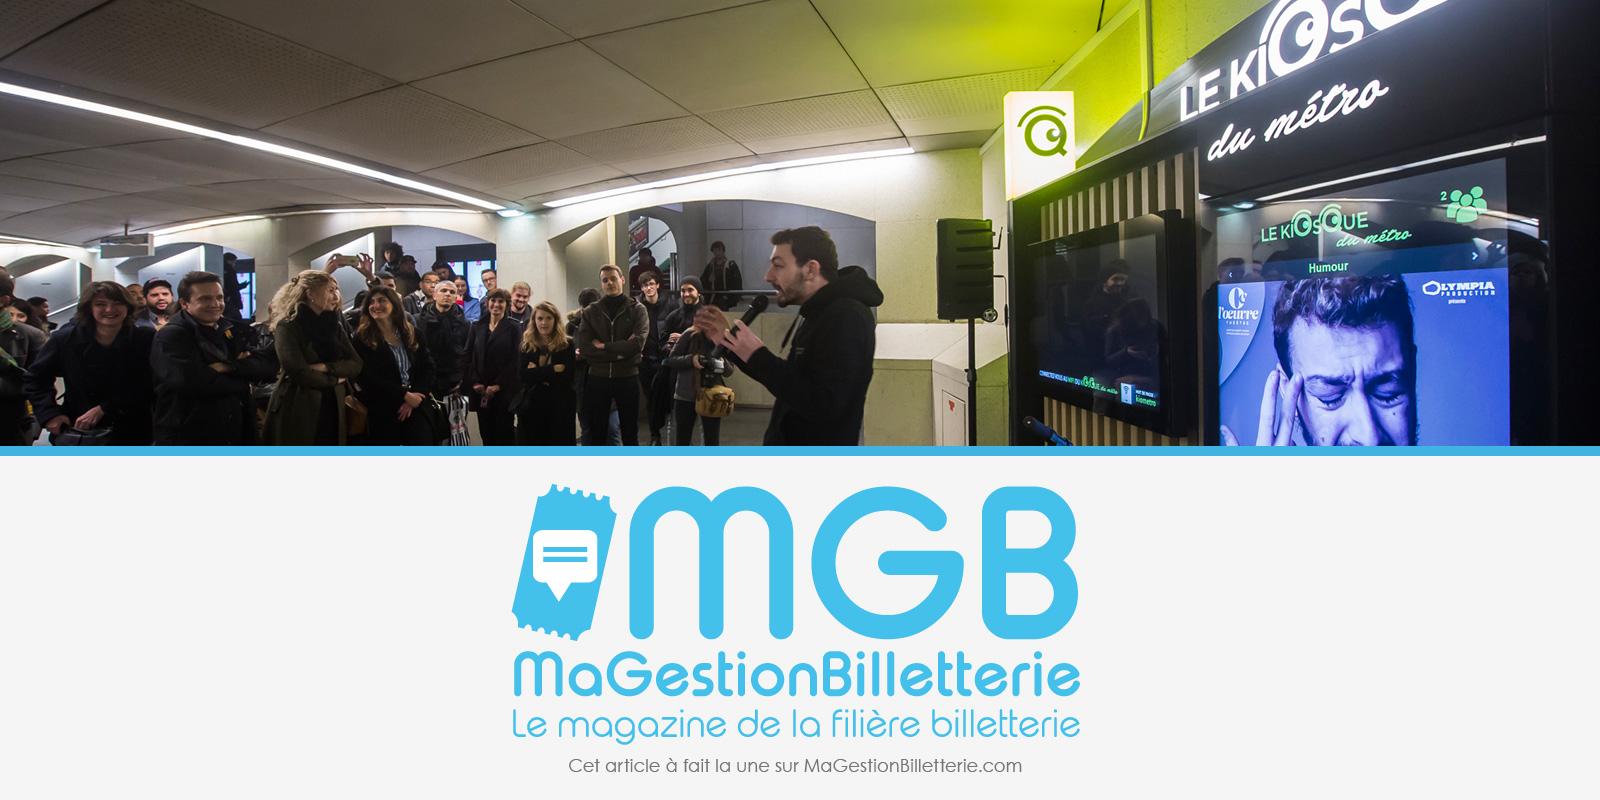 billetreduc-mediatransports-une6